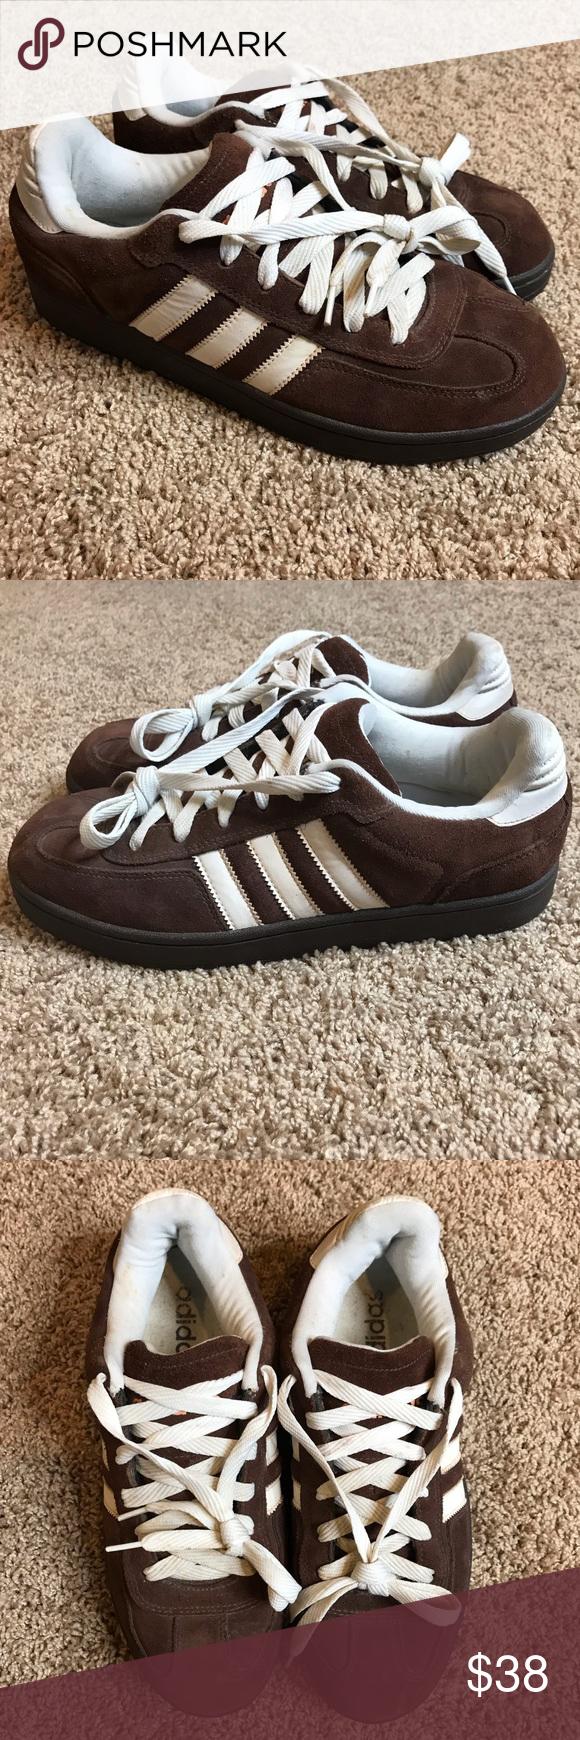 adidas Shoes Men Size 12 Brown Suede Lace Up Excellent condition ...